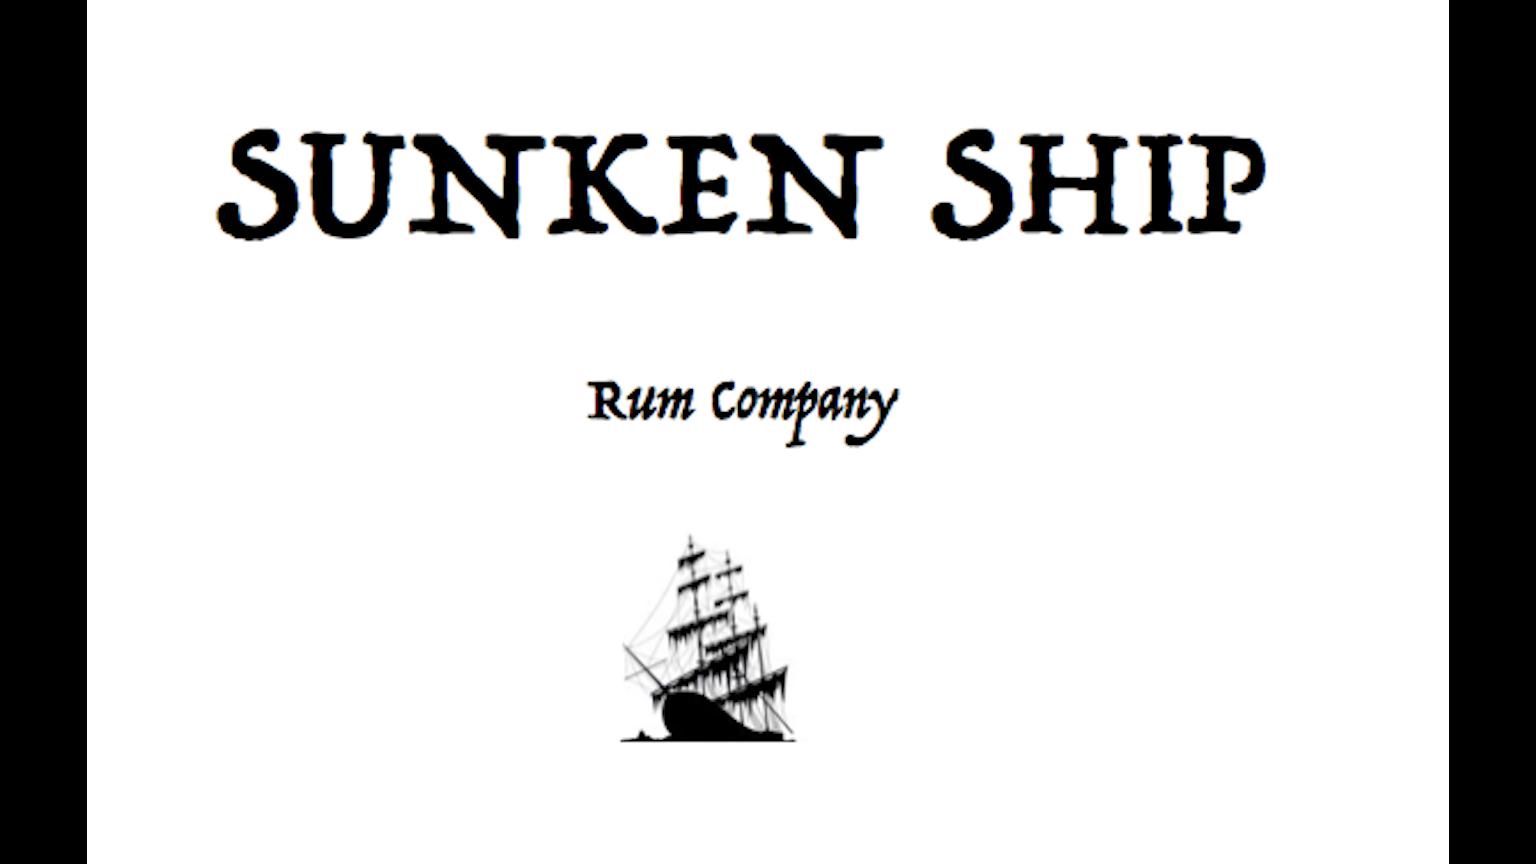 Sunken Ship Rum Company by A. E. Asriel I. —Kickstarter